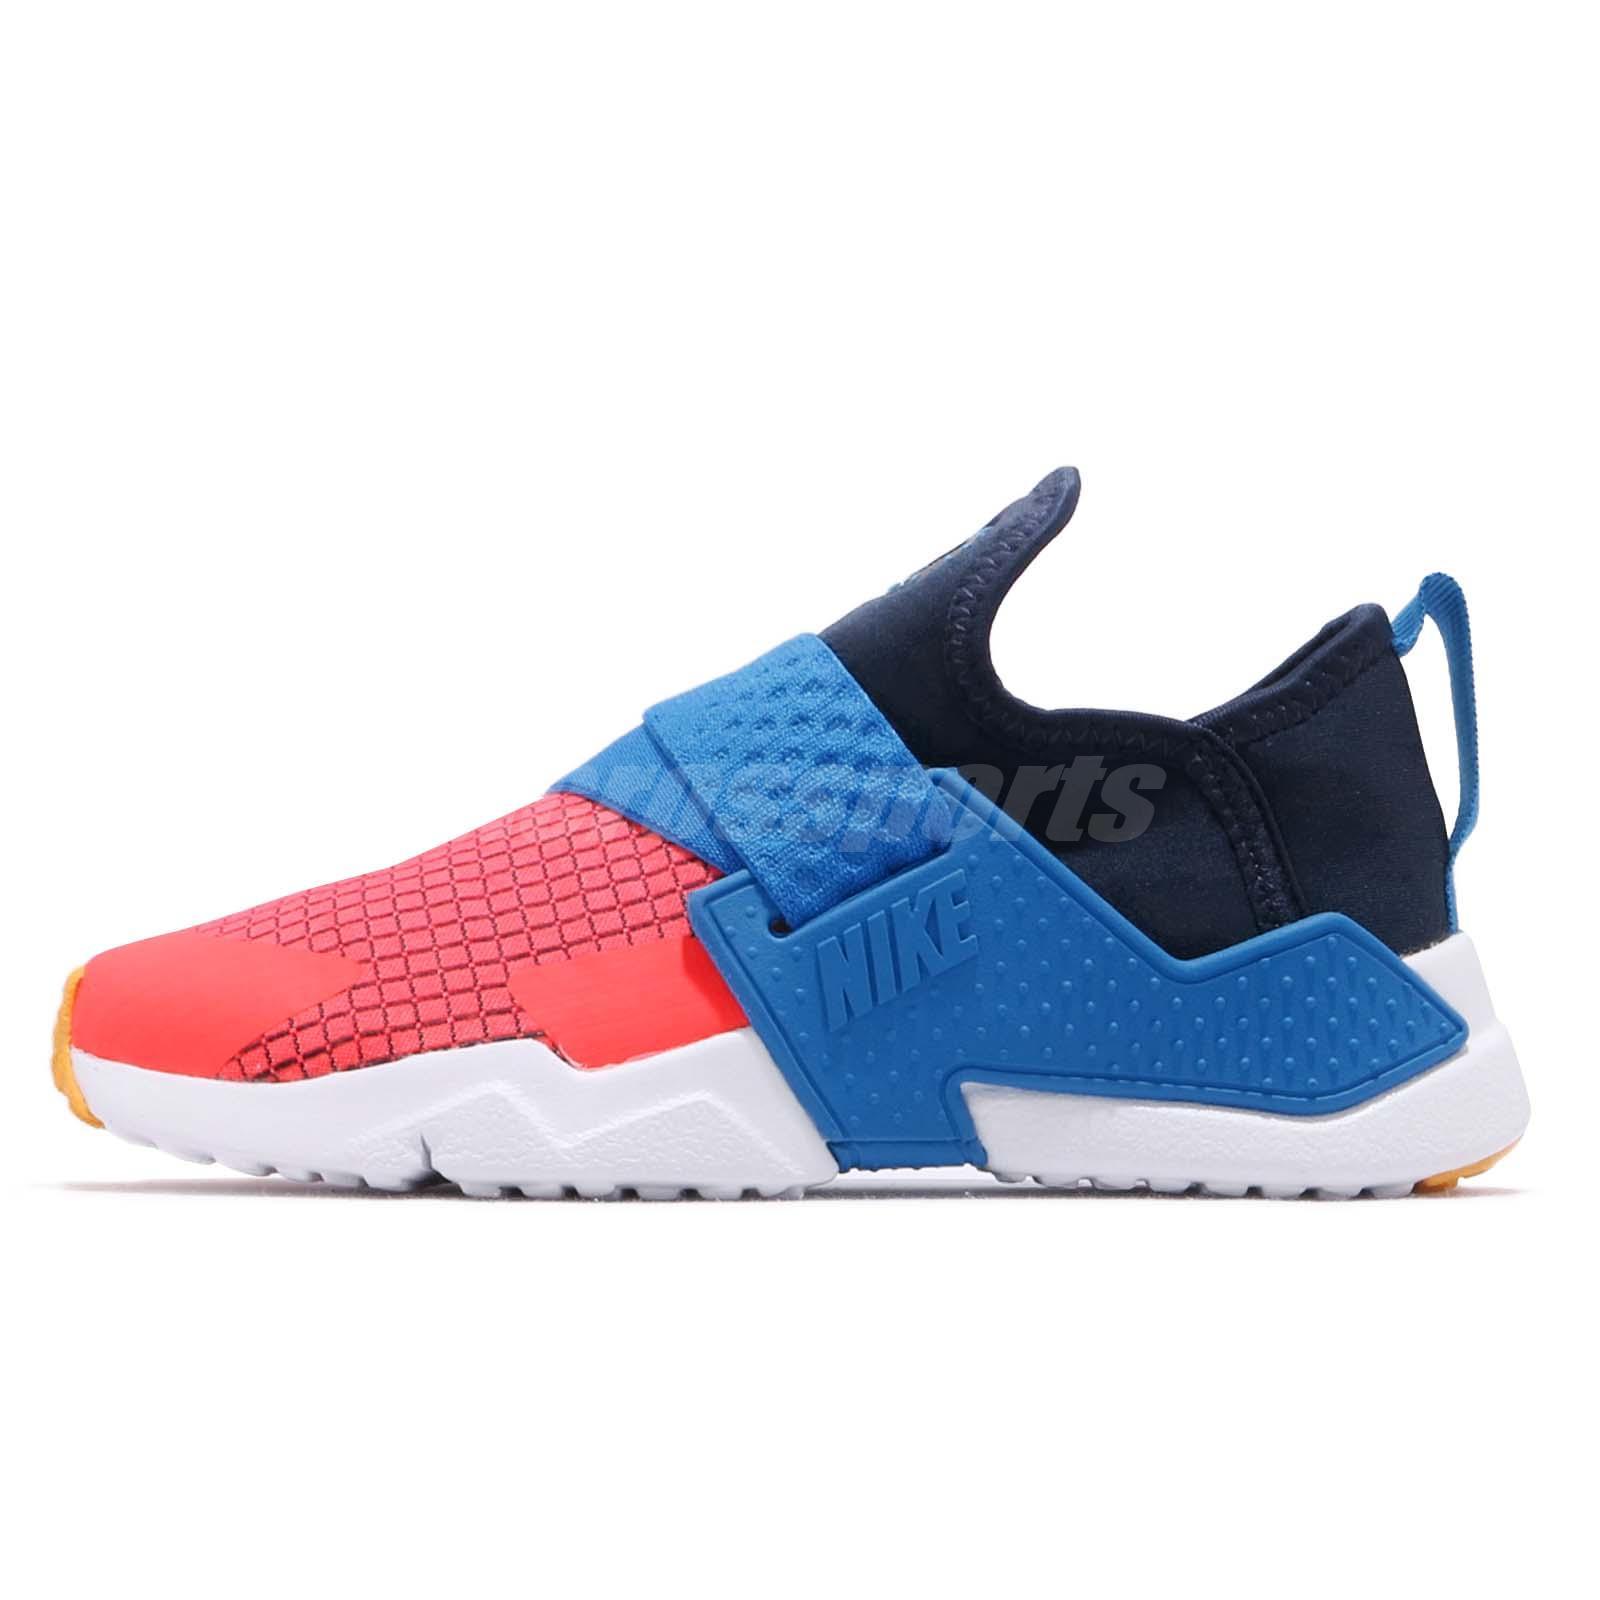 new concept 036a9 a4718 Nike Huarache Extreme Now PS Navy Amarillo Blue Kid Preschool Shoes BQ7569- 400